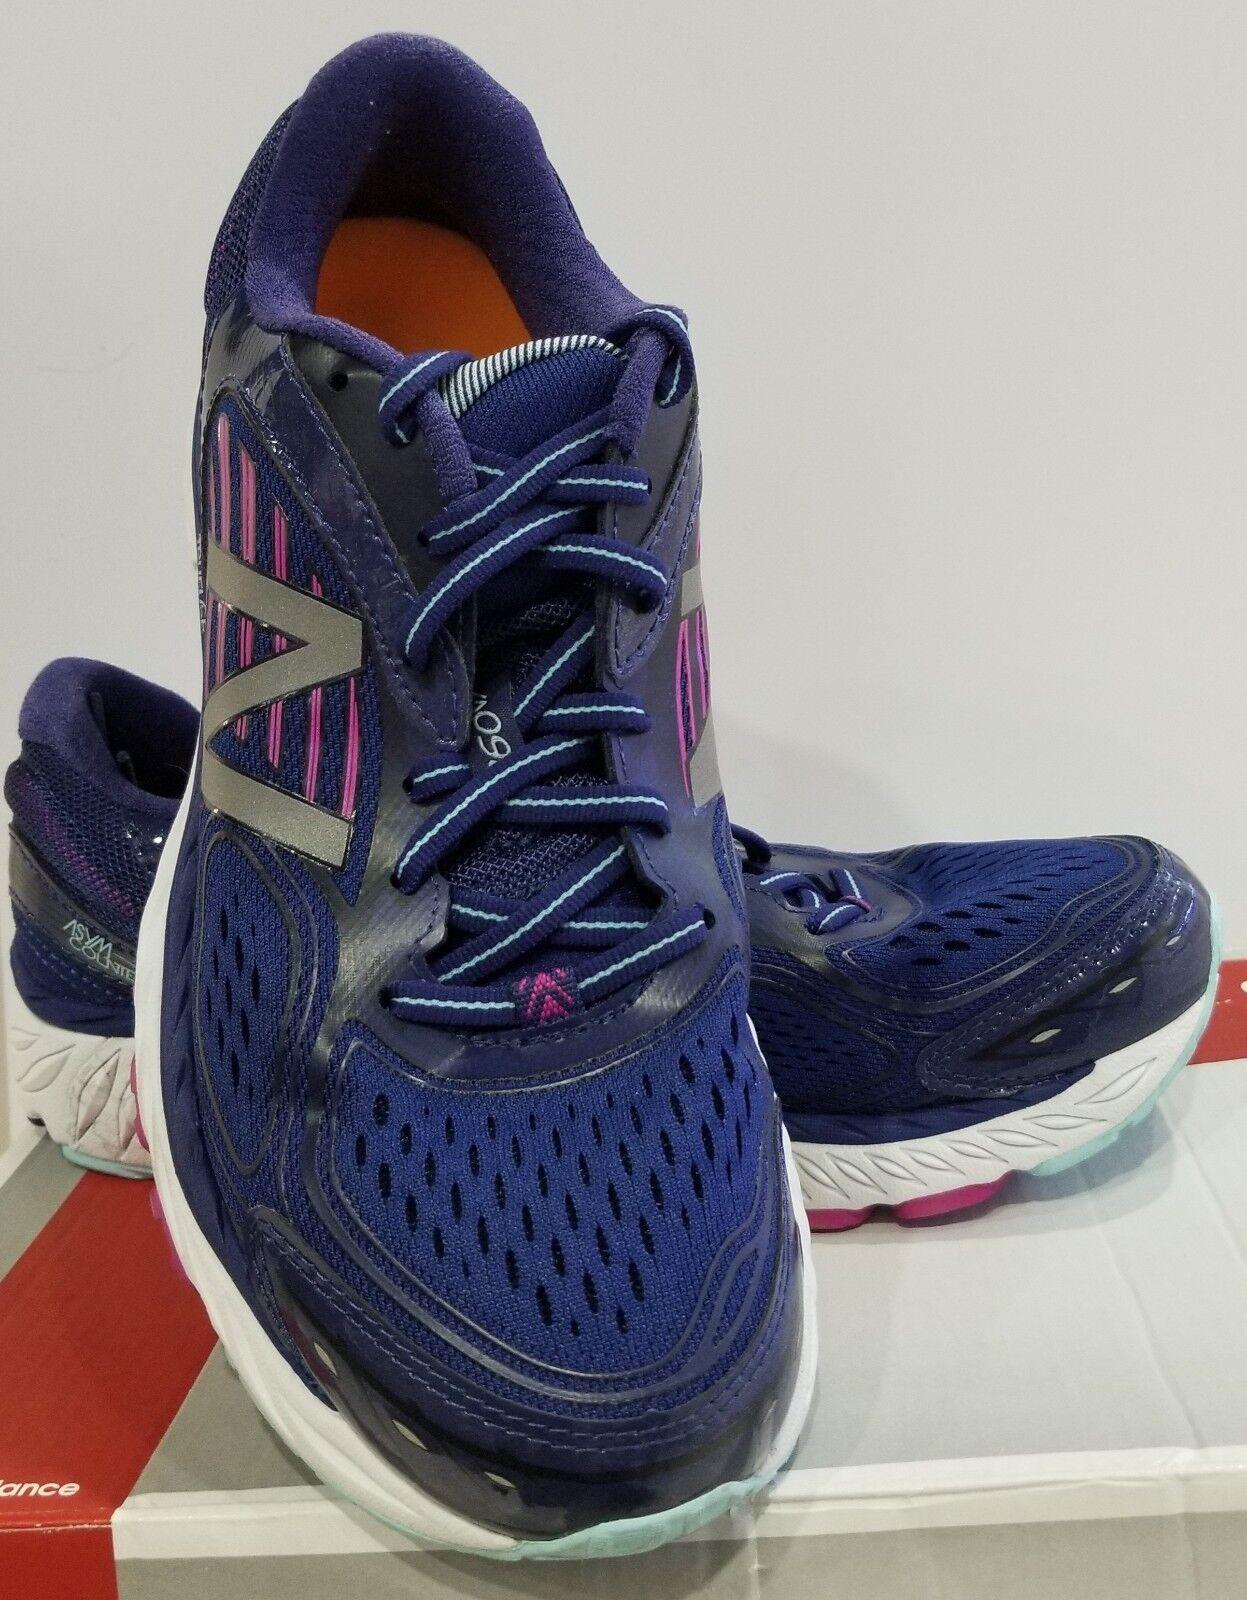 Mujer Zapato De Correr New Balance, Azul Morado, 10 B nosotros, W860BP7